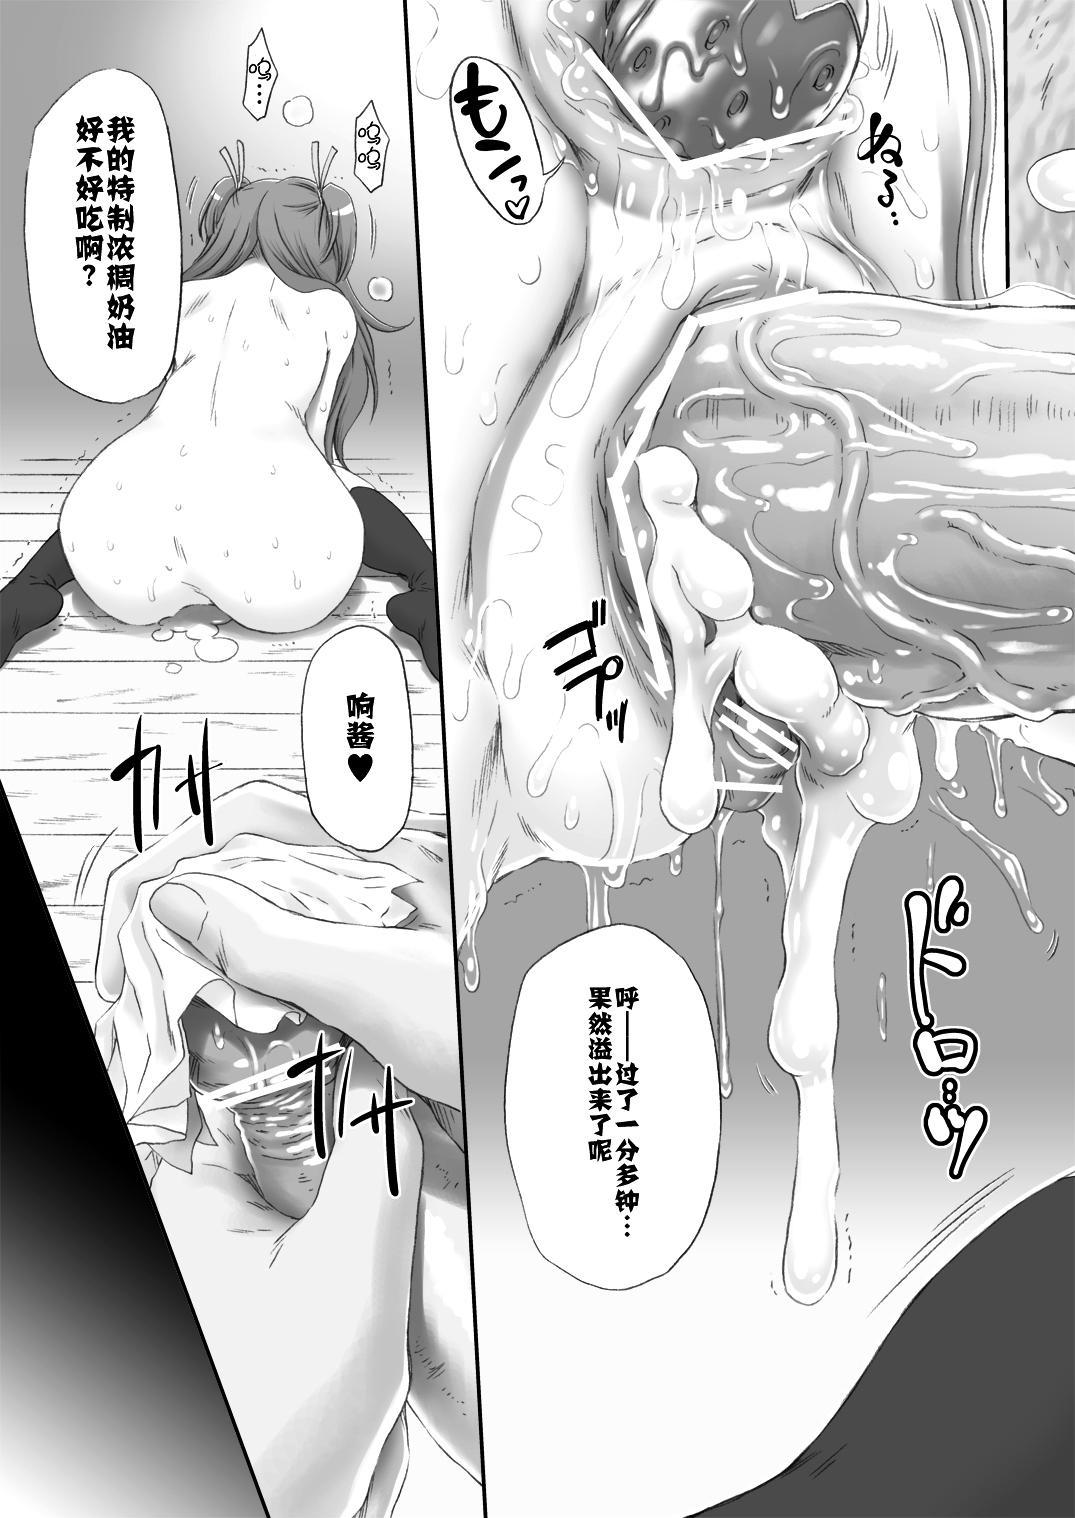 Hibiki de asobou ♪ 30